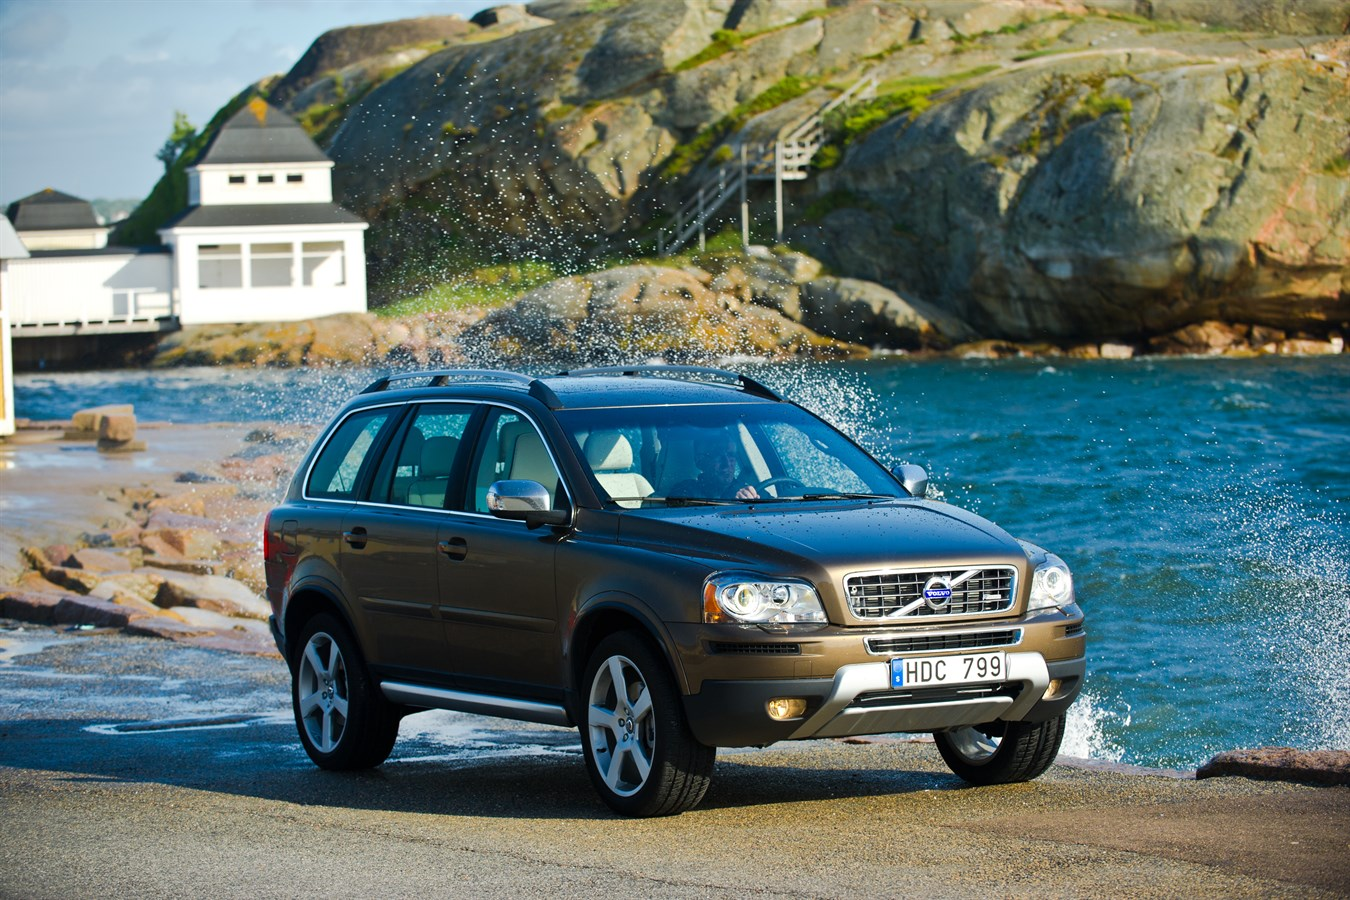 Volvo XC90 - model year 2012 - Volvo Cars Global Media Newsroom